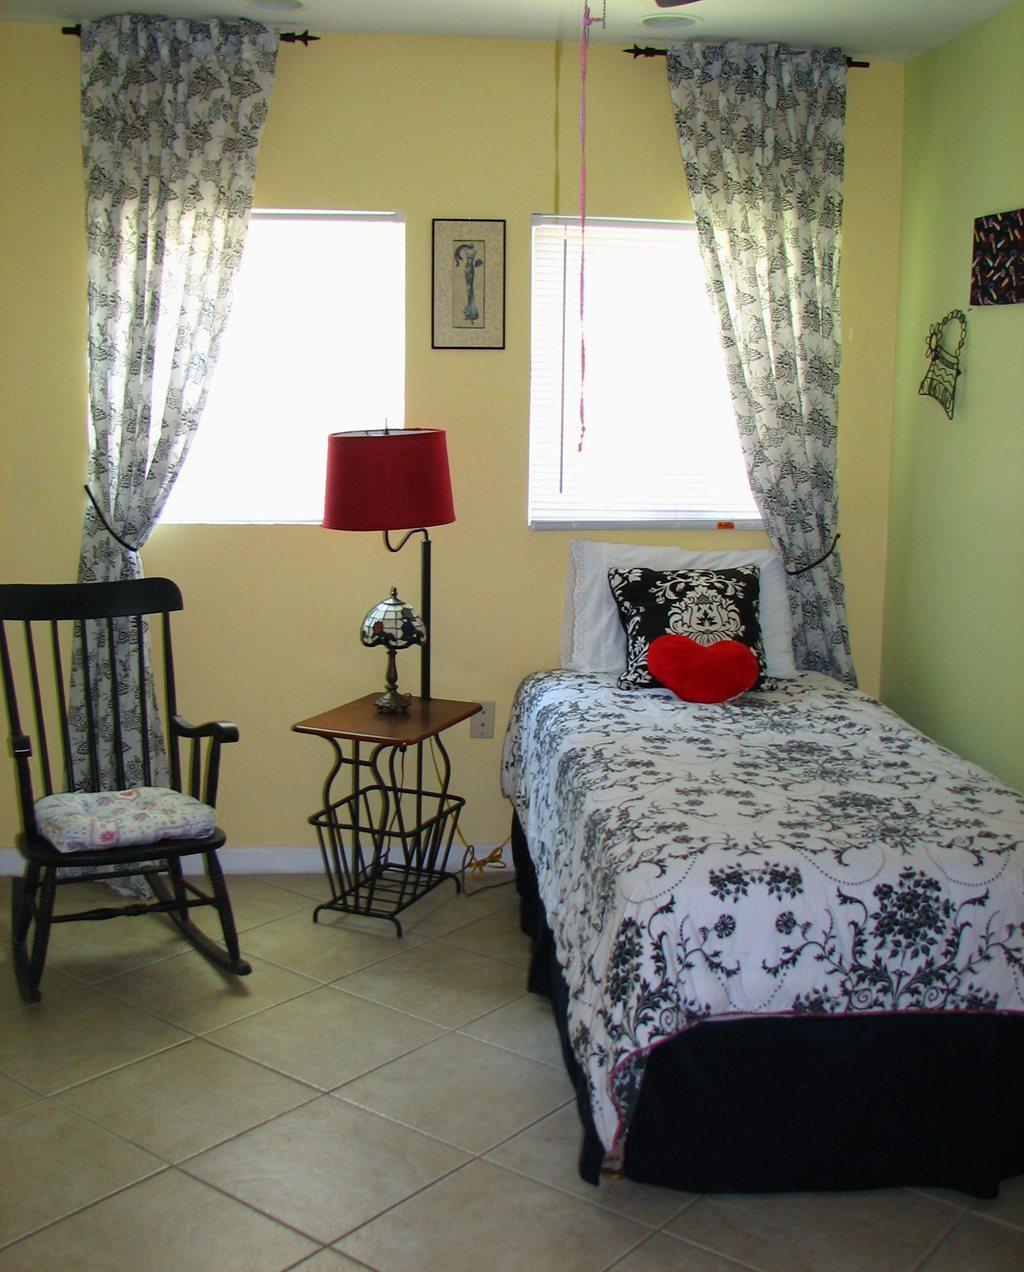 Arizona Elderly Care Home